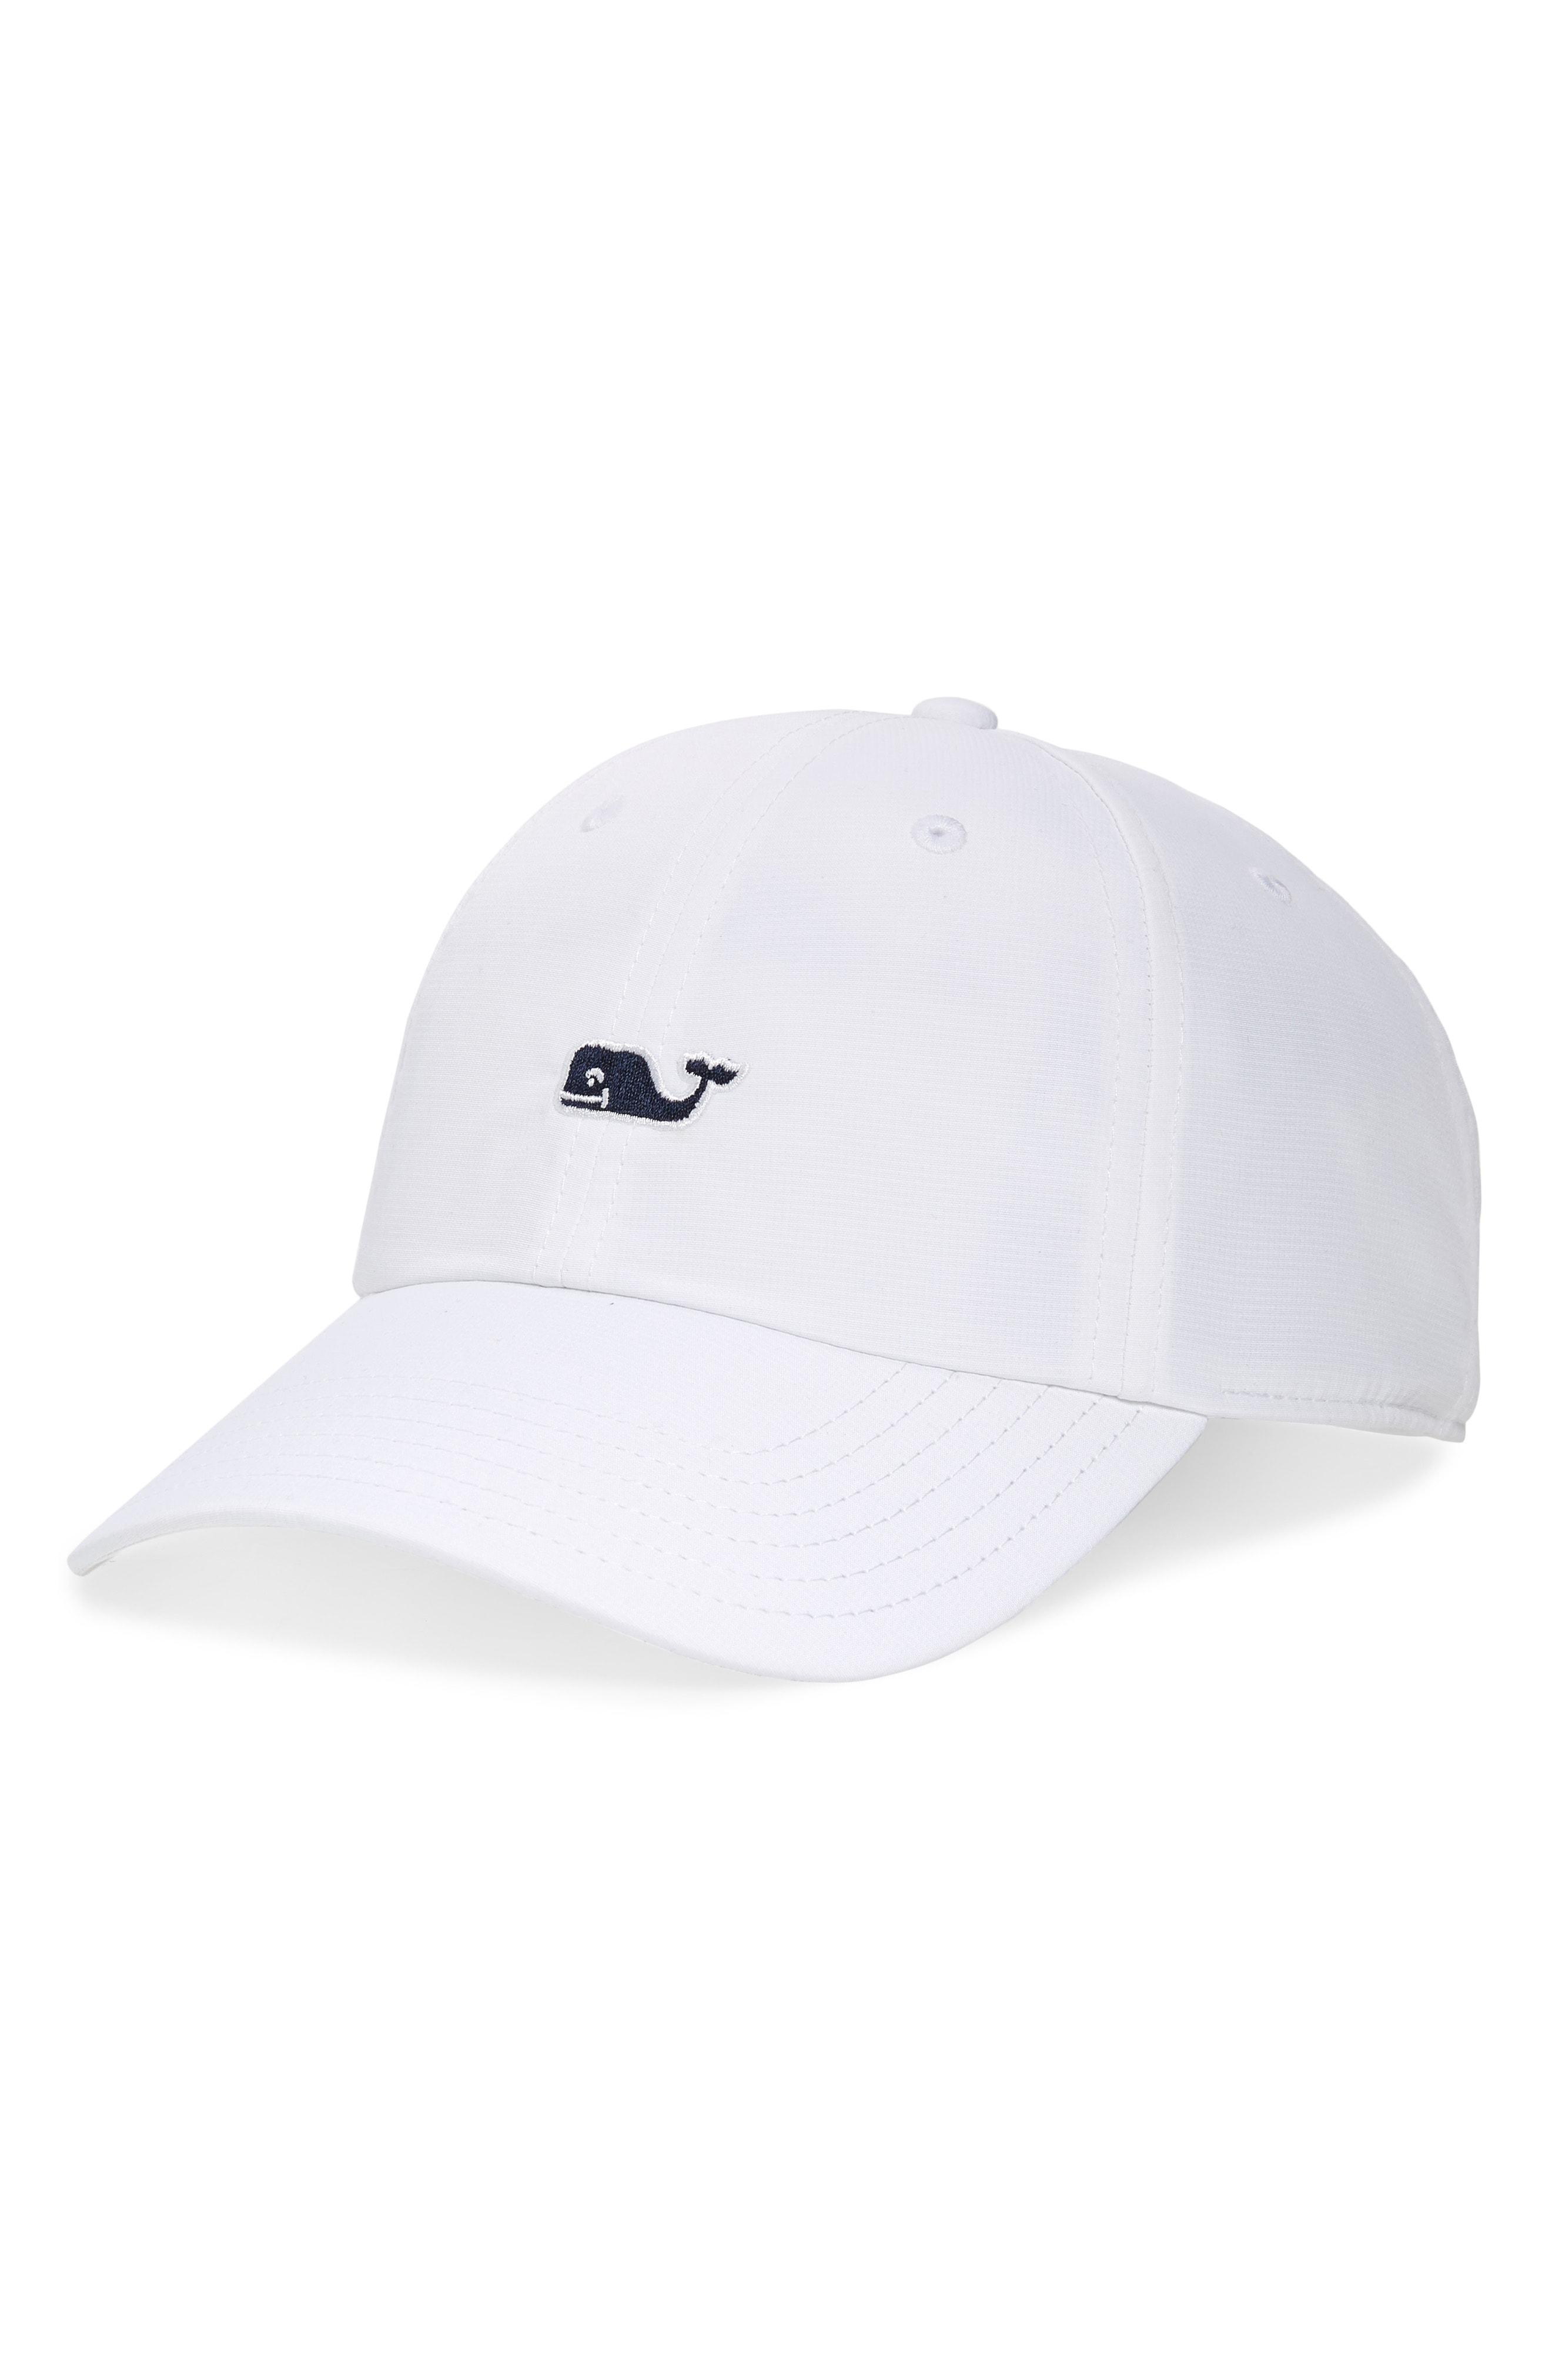 Whale Logo Baseball Cap.